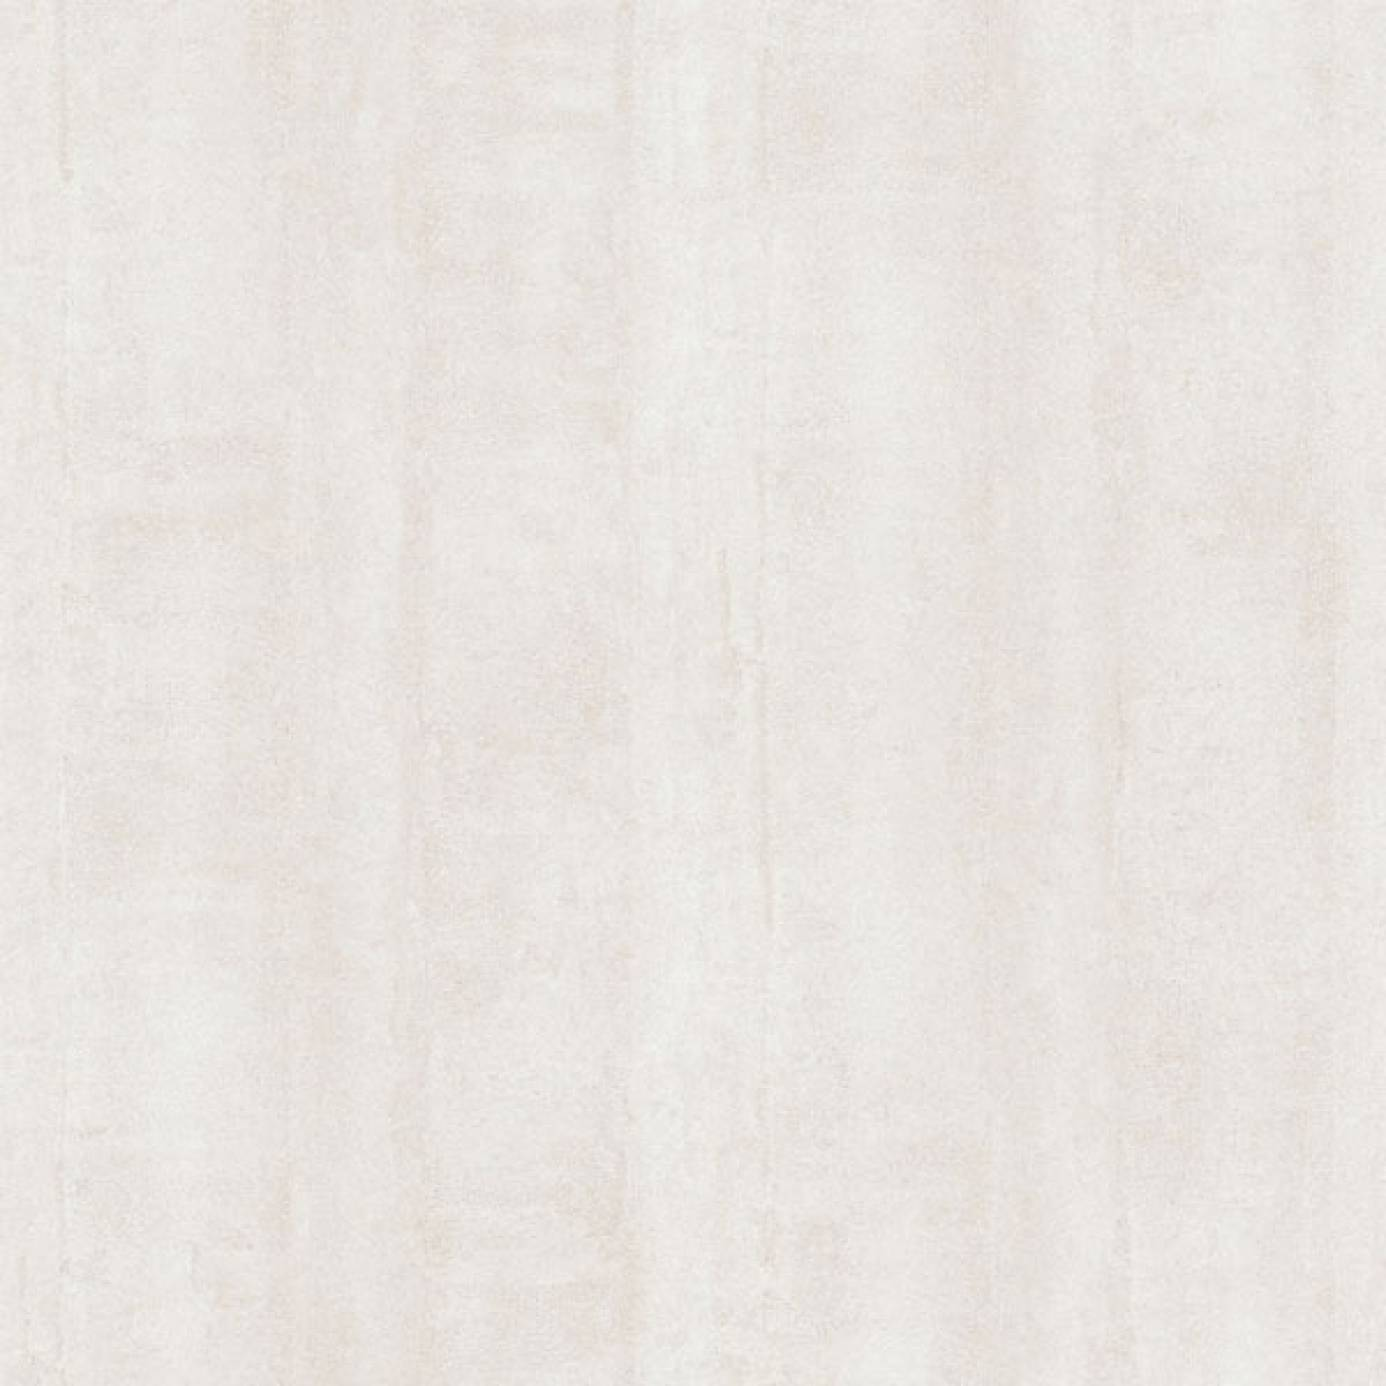 Французские обои Casadeco,  коллекция So White 2, артикулSWI19321214